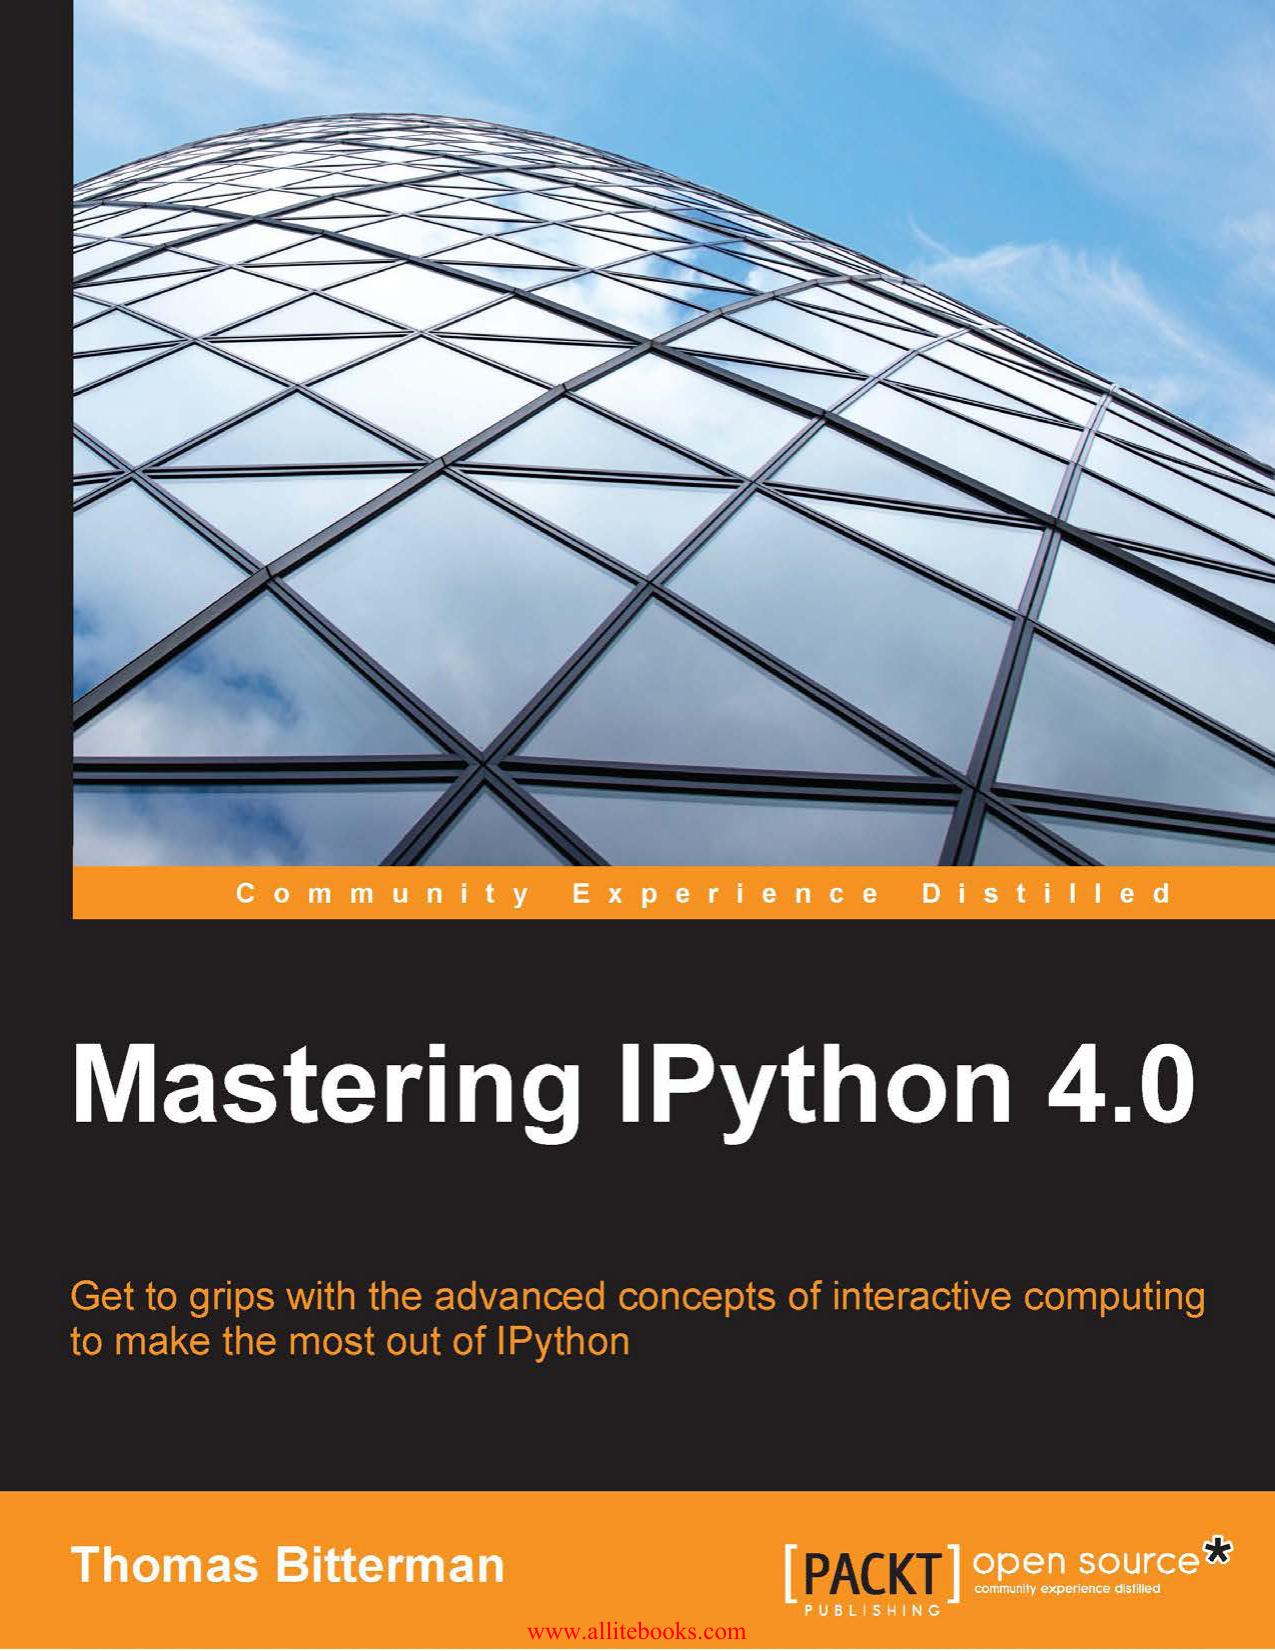 Mastering IPython 4 0 | manualzz com